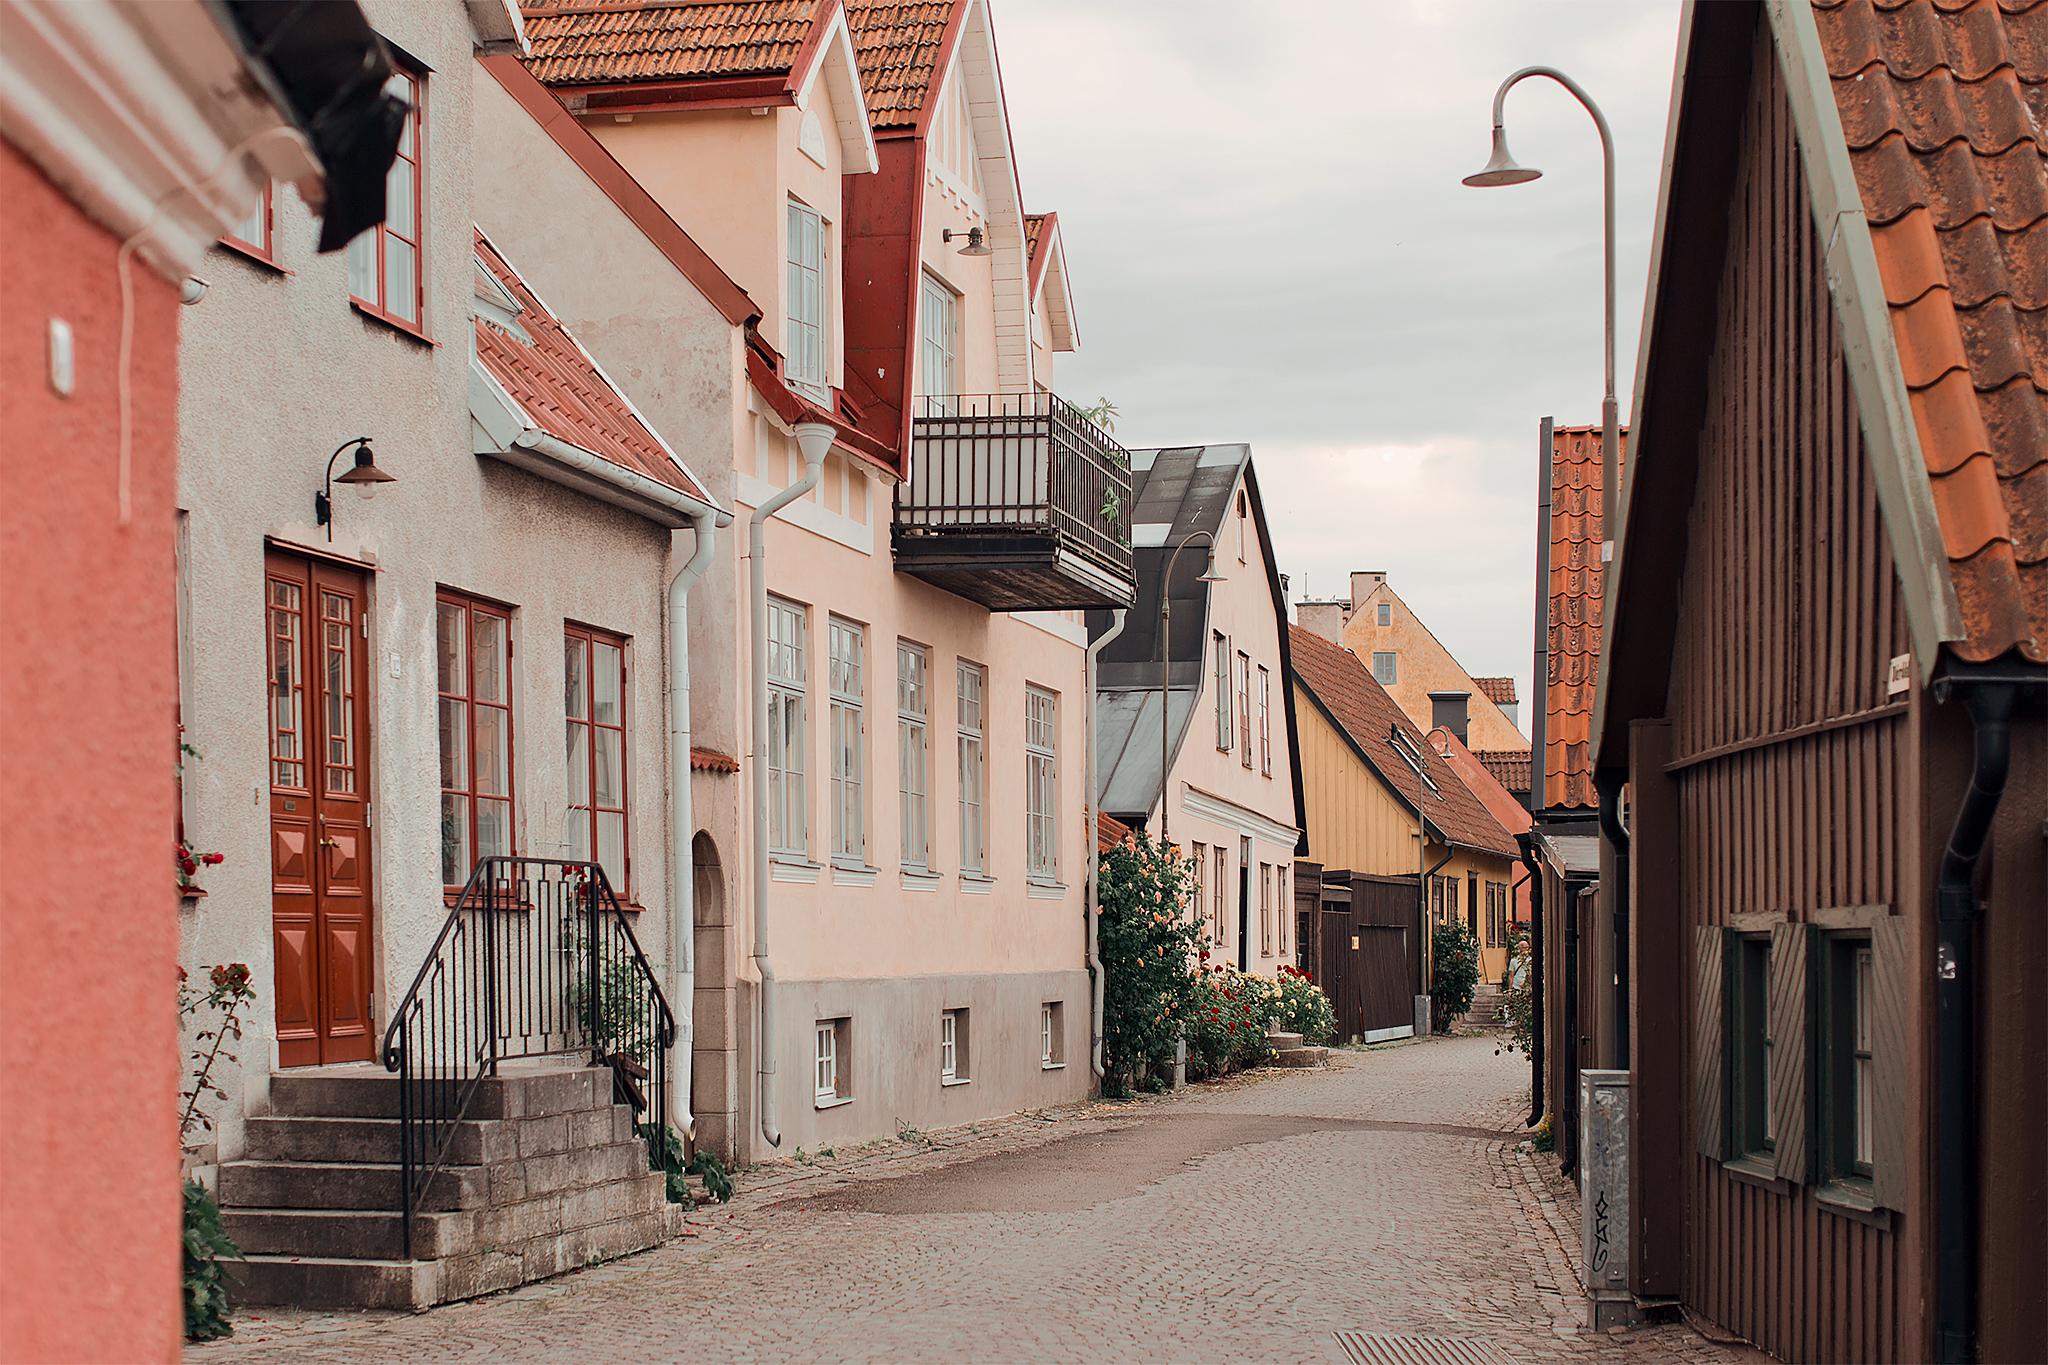 Resedagbok Gotland: Visby